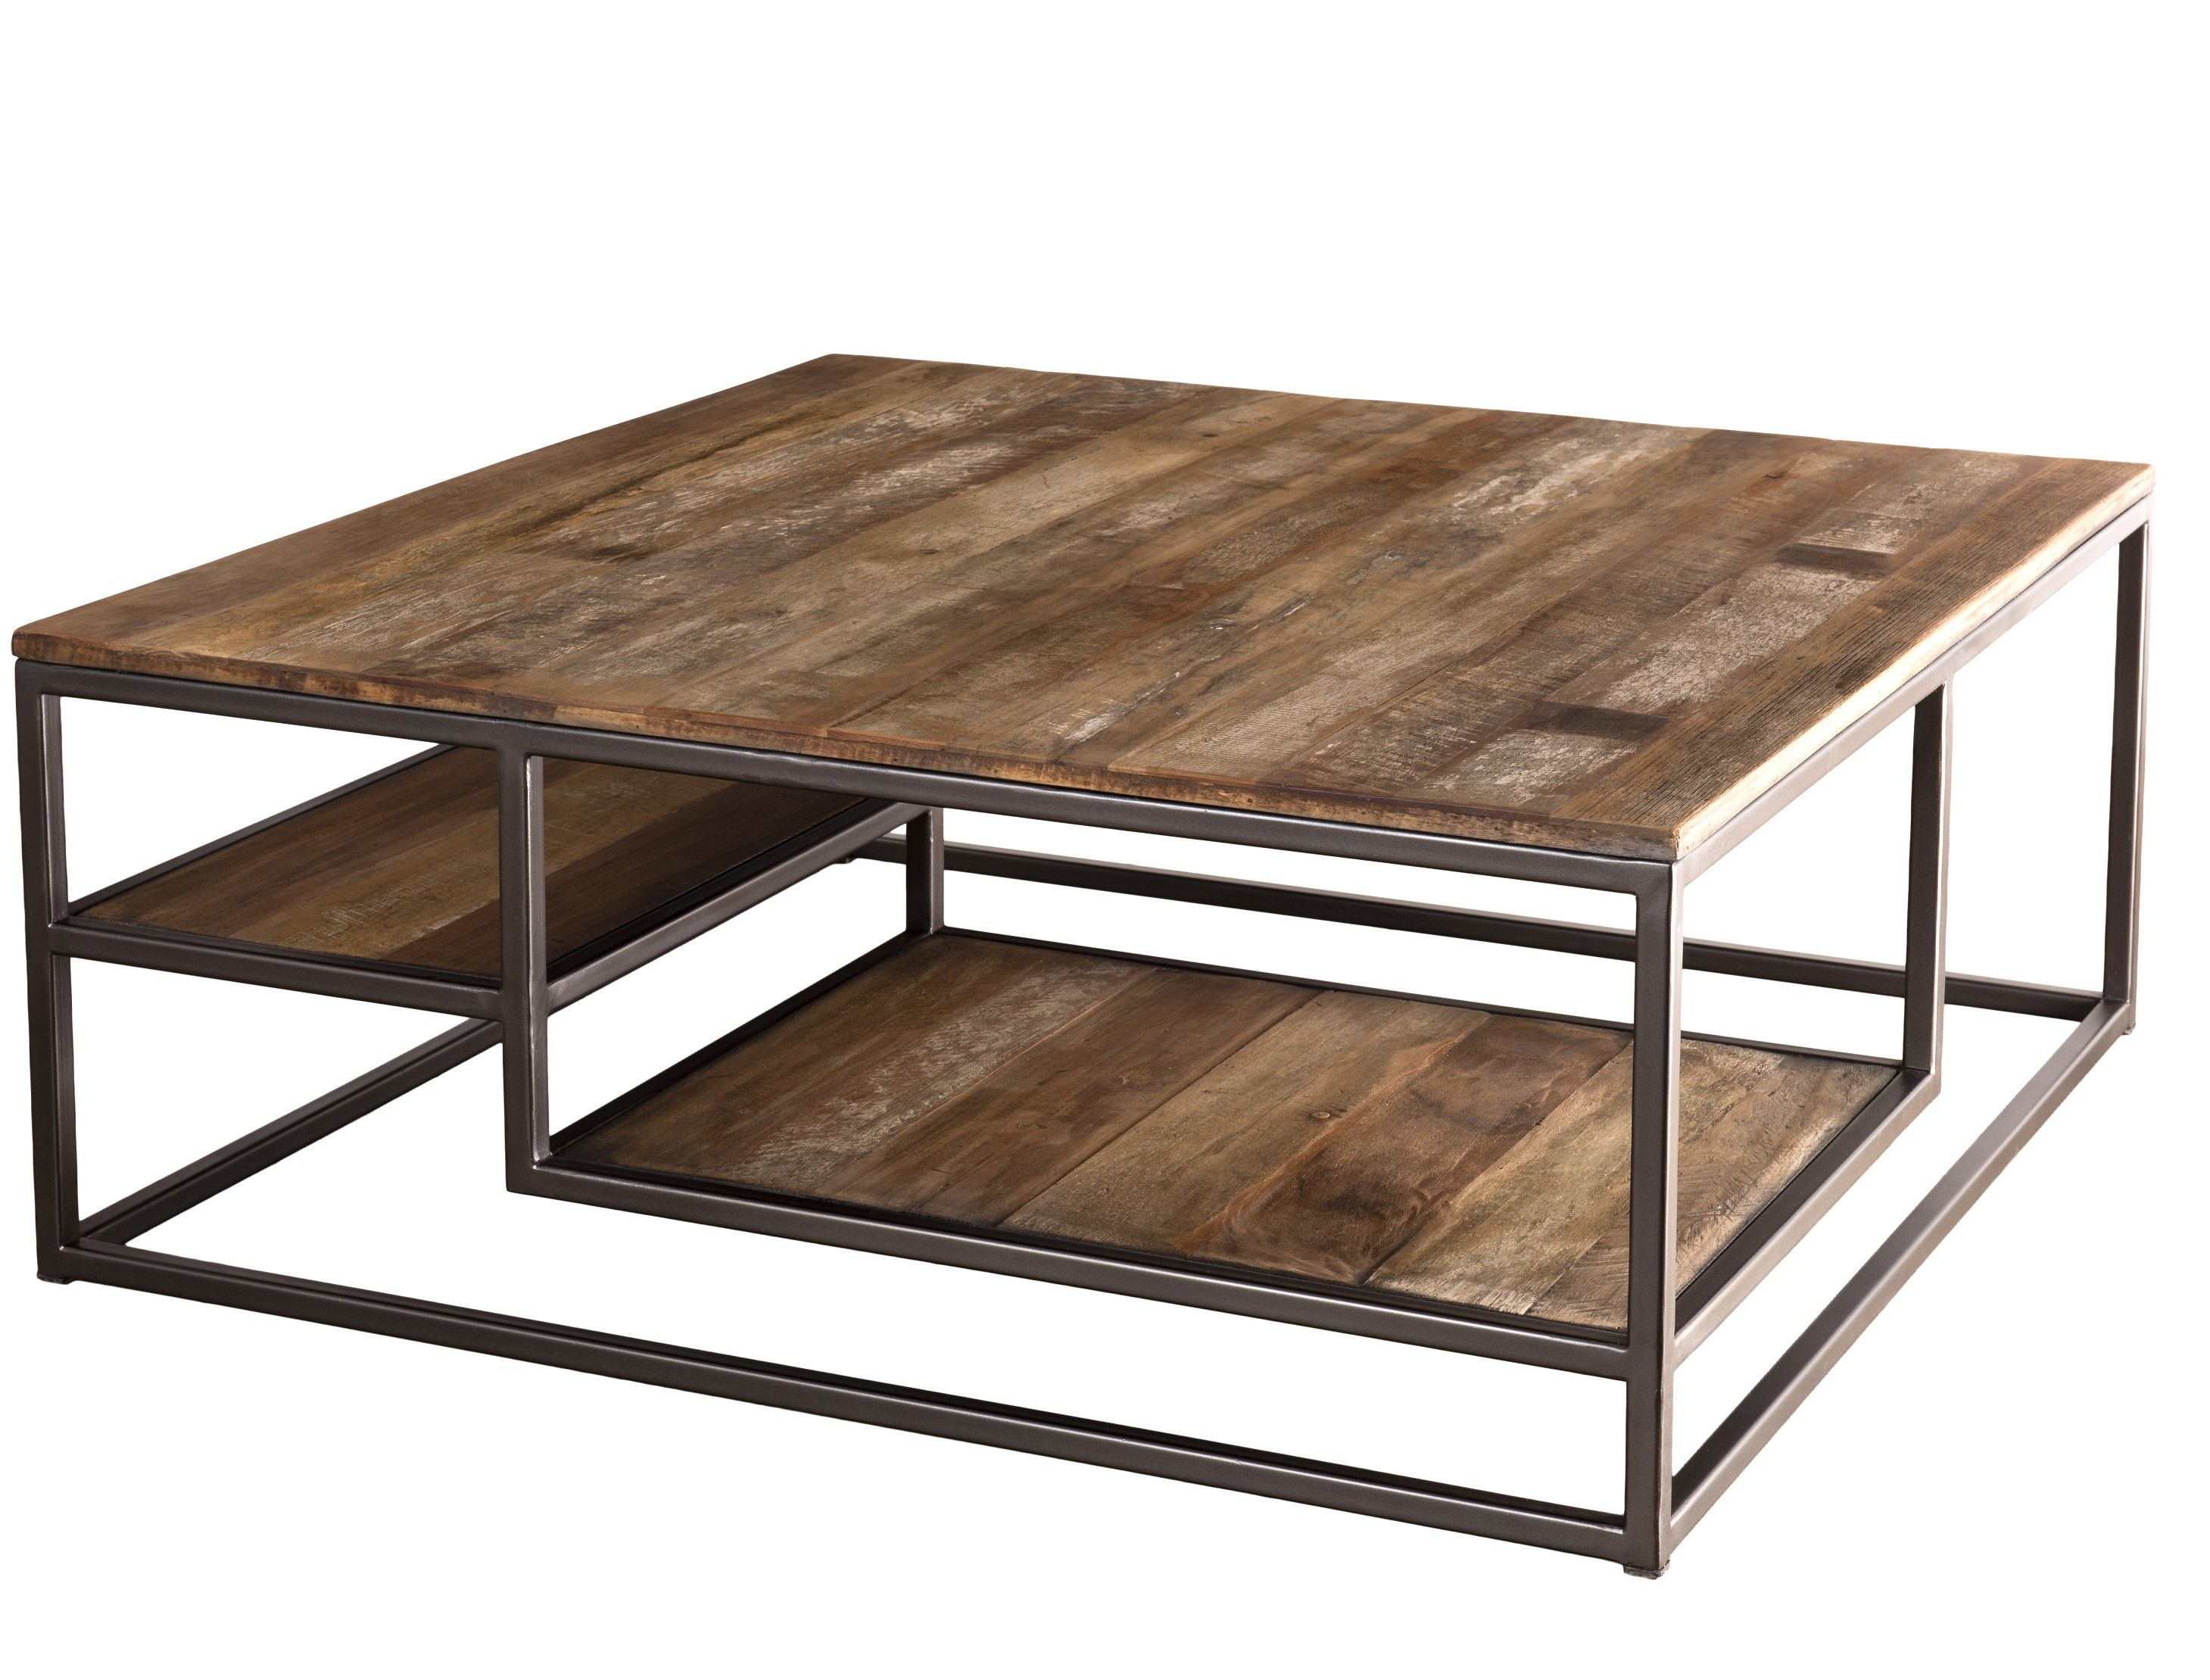 Table Basse Carree Acacia Massif Fonce Et Metal Noir Panka Table Basse Carree Table Basse Table Basse Bois Metal